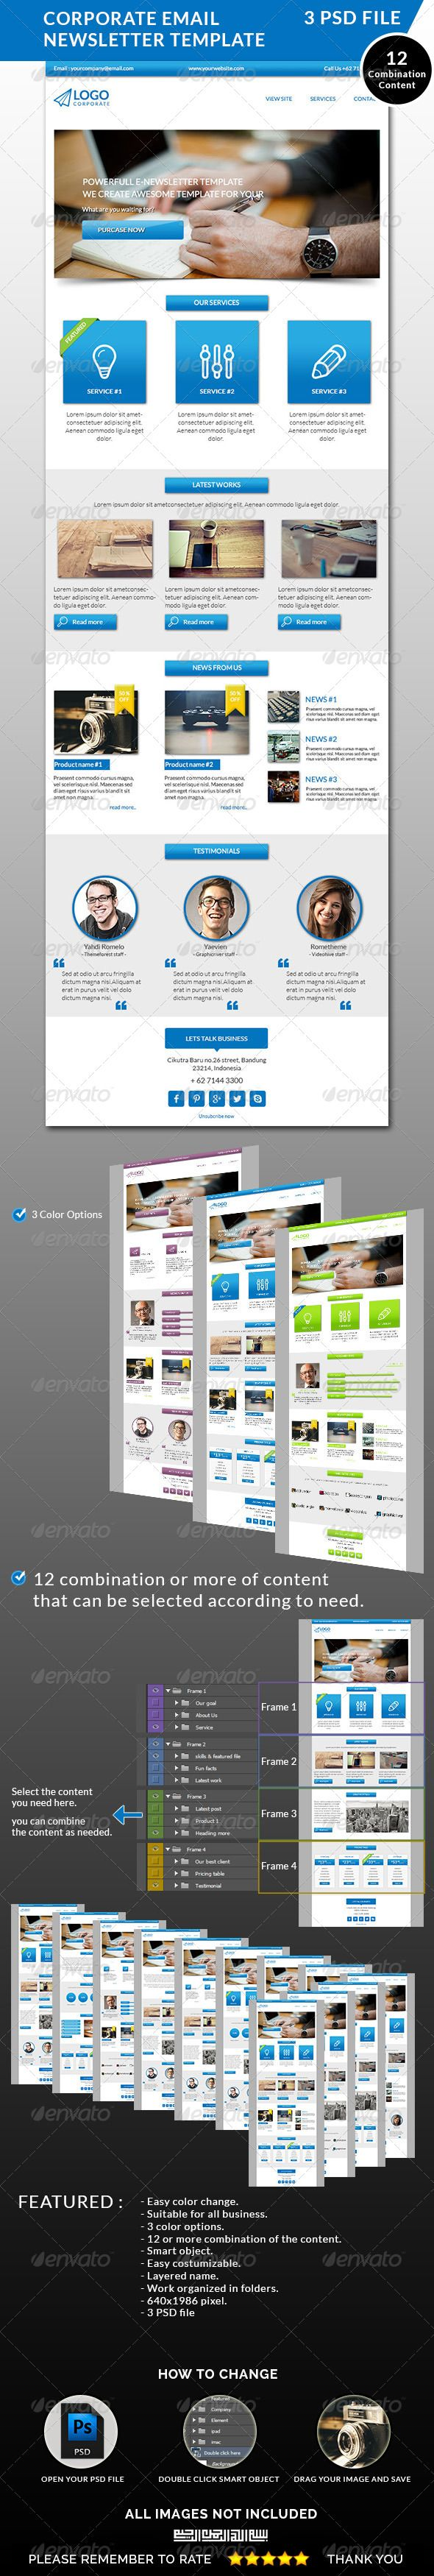 Corporate Email Newsletter Template #email #newsletter #corporate #template #promotion #emailtemplate #marketing #offer #webmarketing #psd #graphicriver #yahdiromelo #rometheme #yaevien